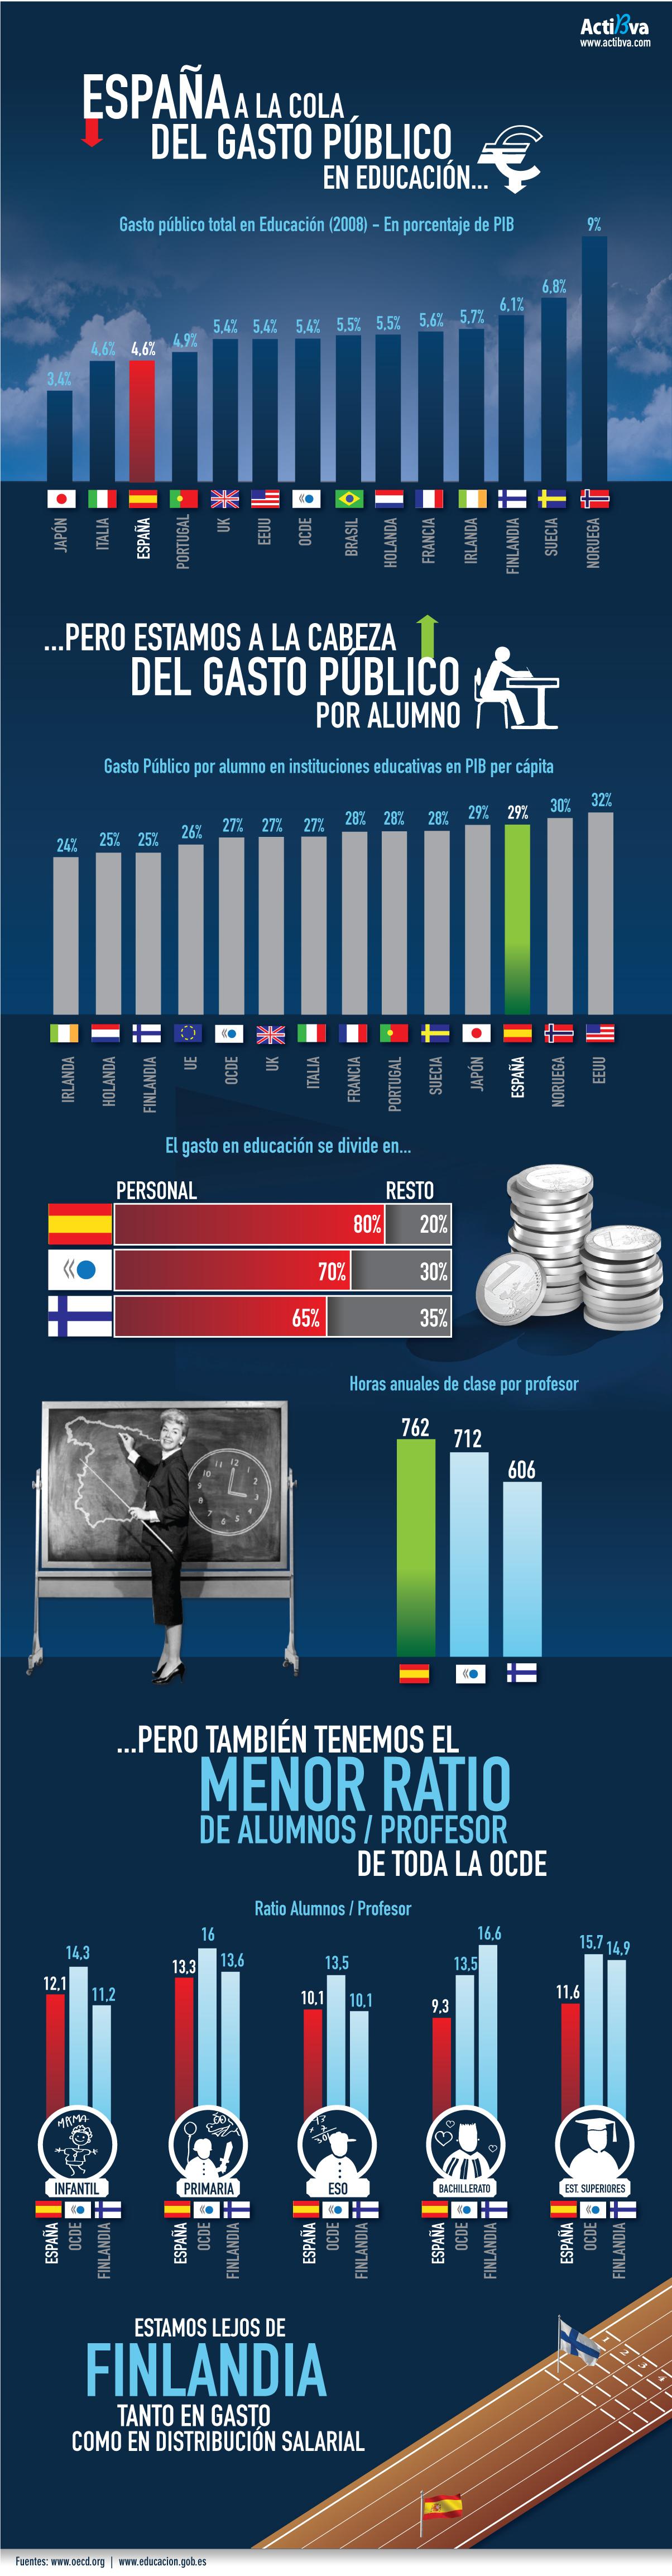 gasto-publico-educacion-espana.jpg